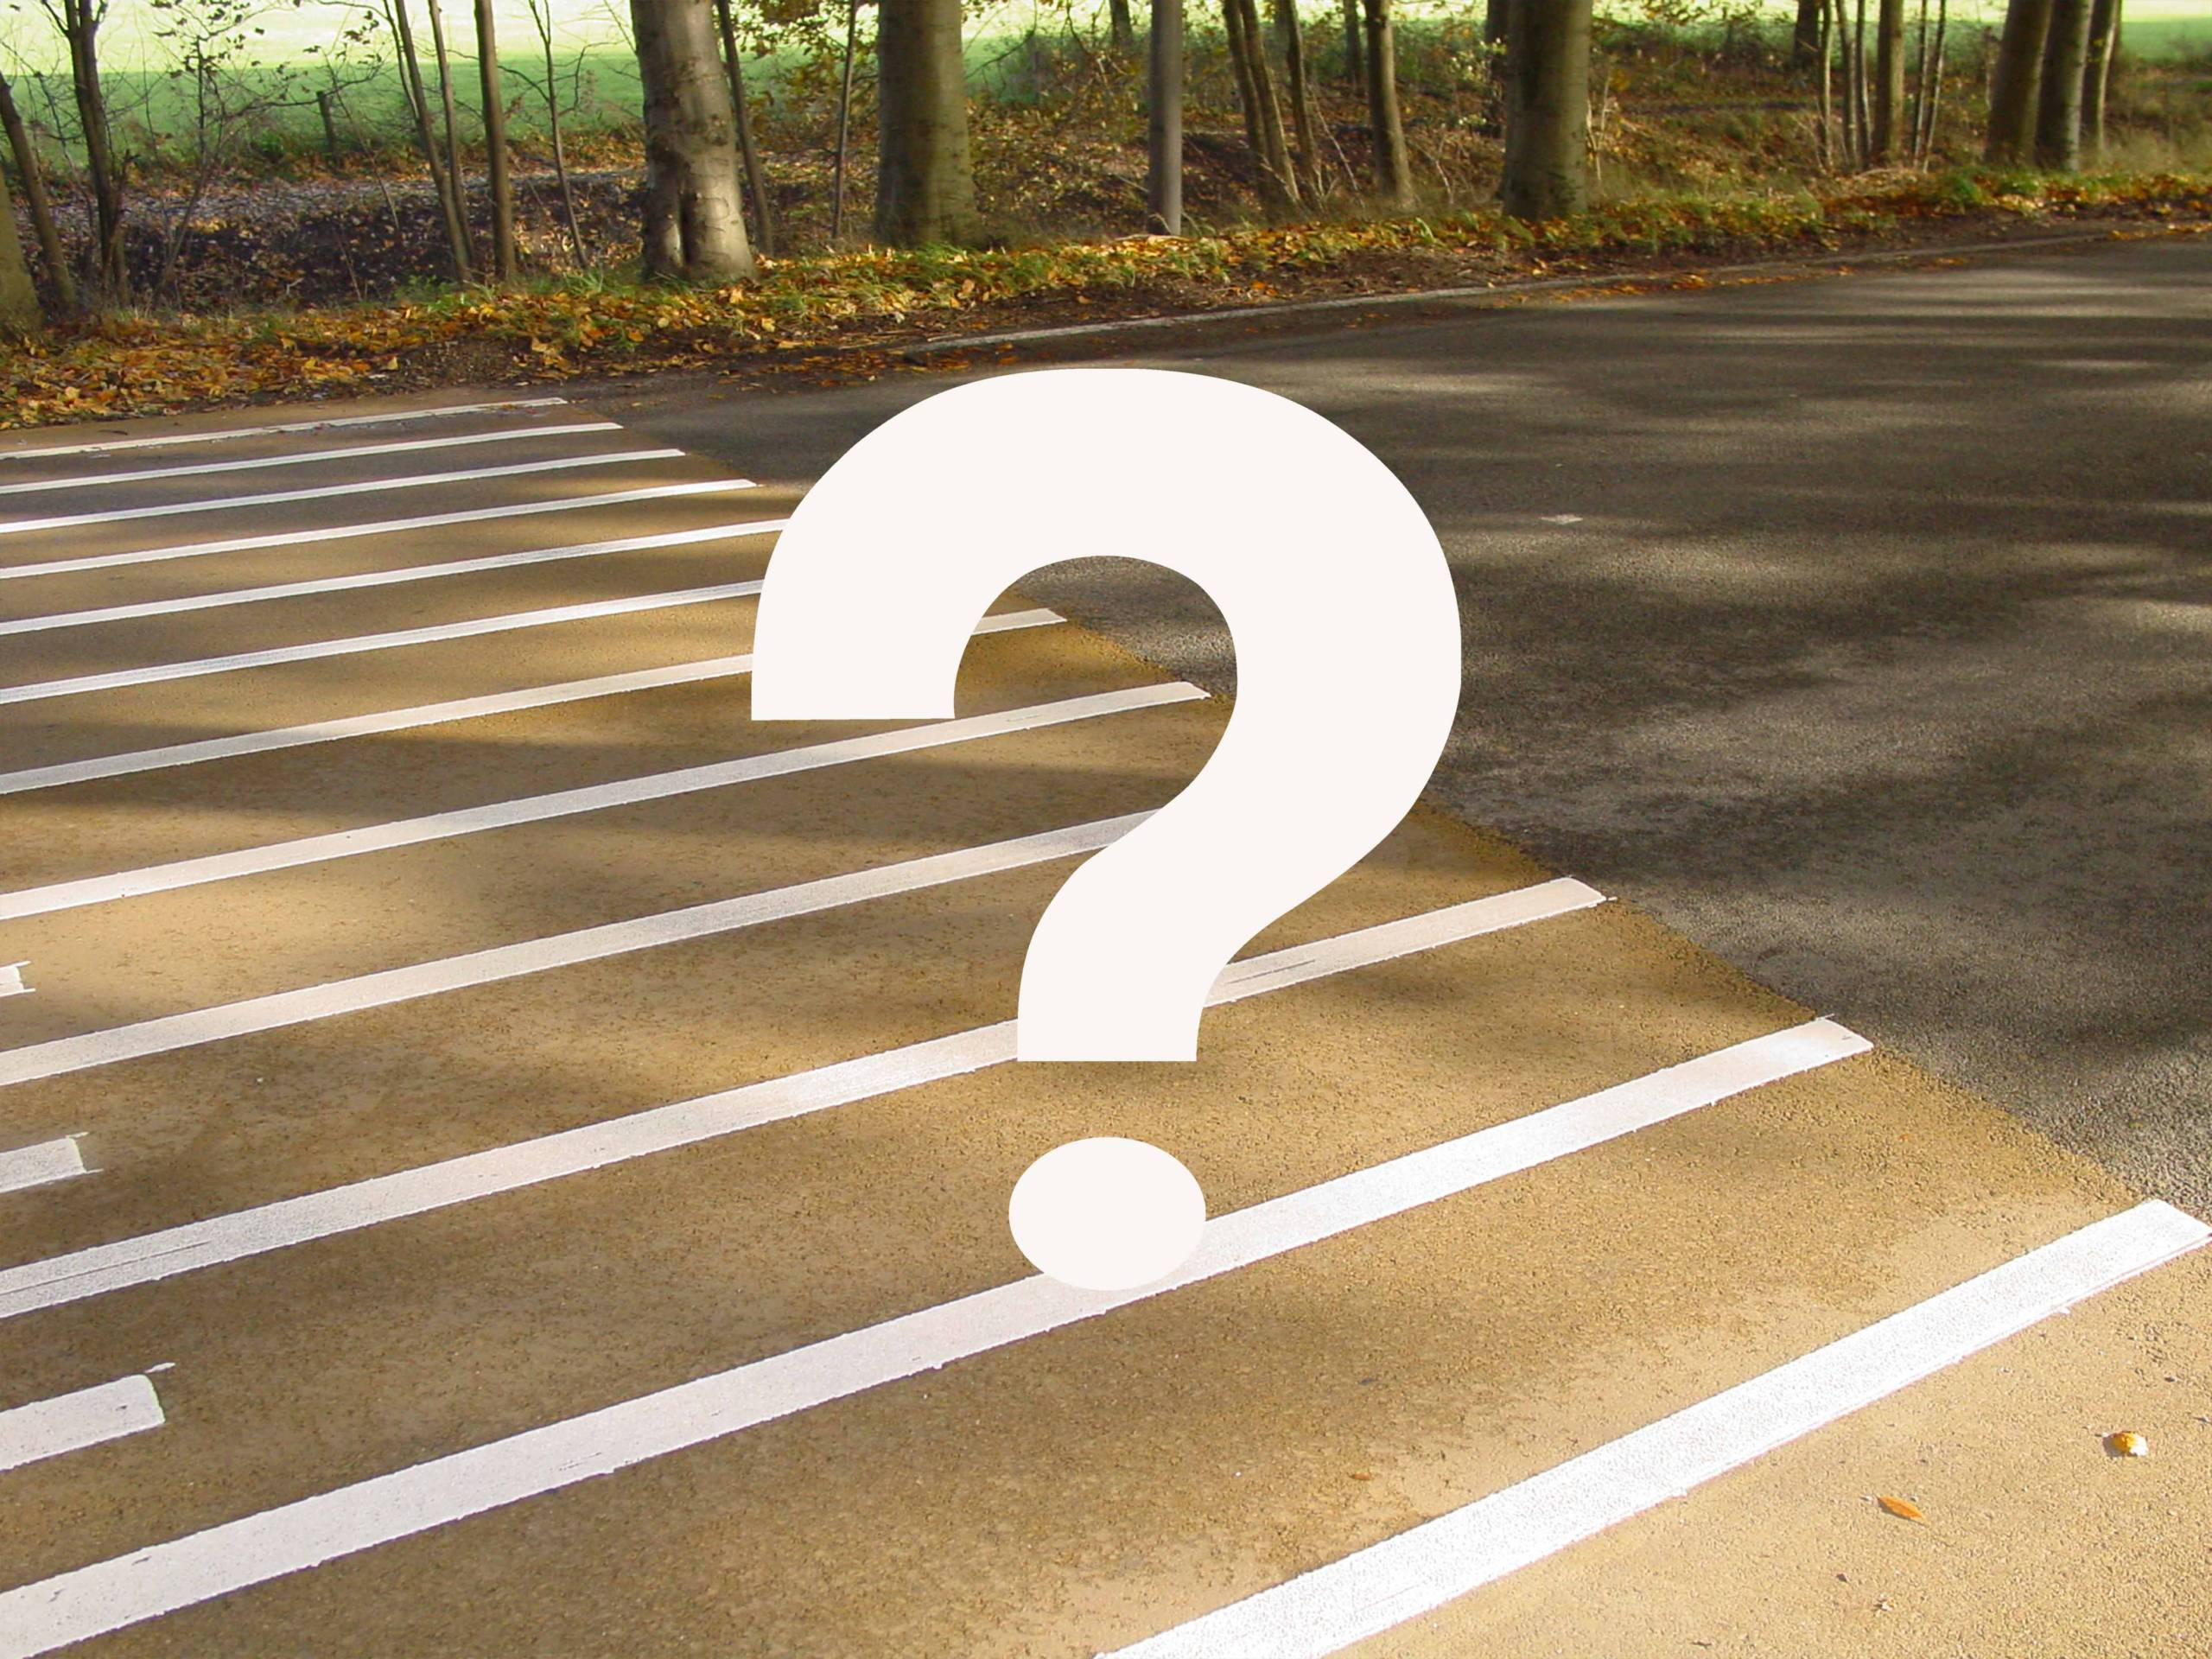 Vragen over kleur asfalt